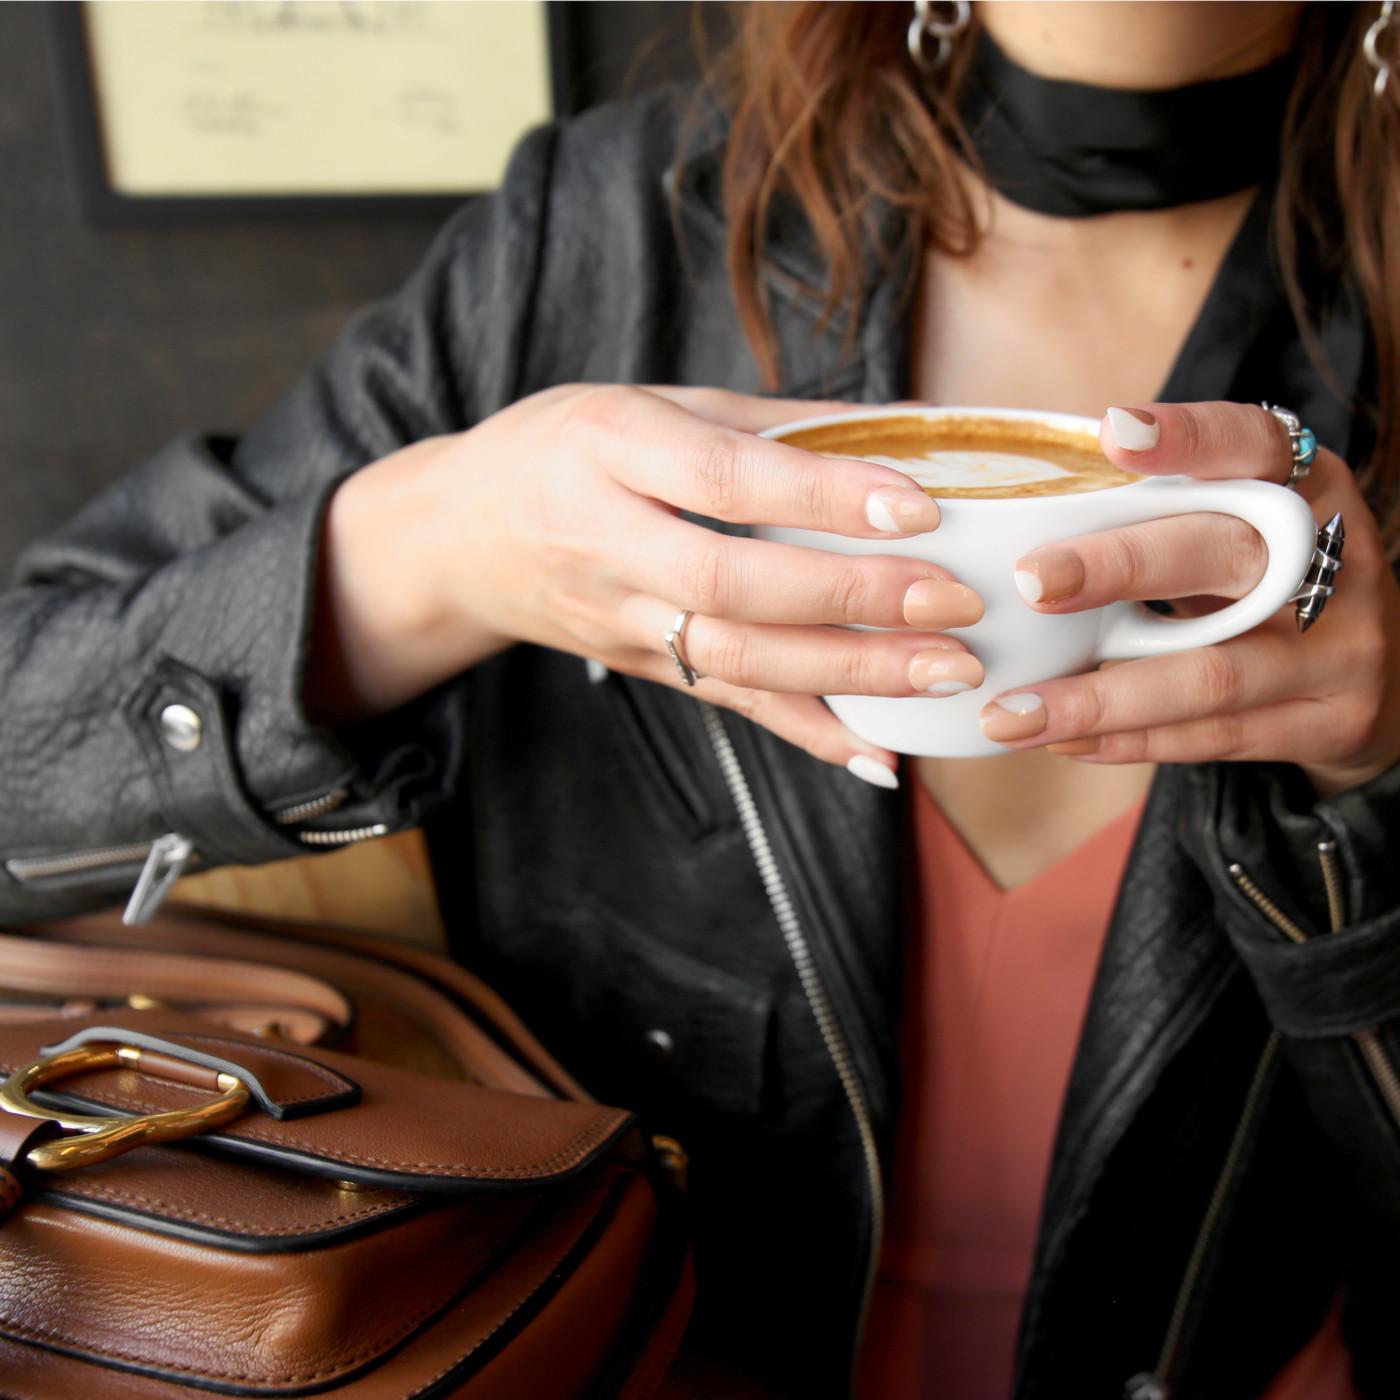 National Coffee Day Nail Tutorial | Sally Hansen Mani